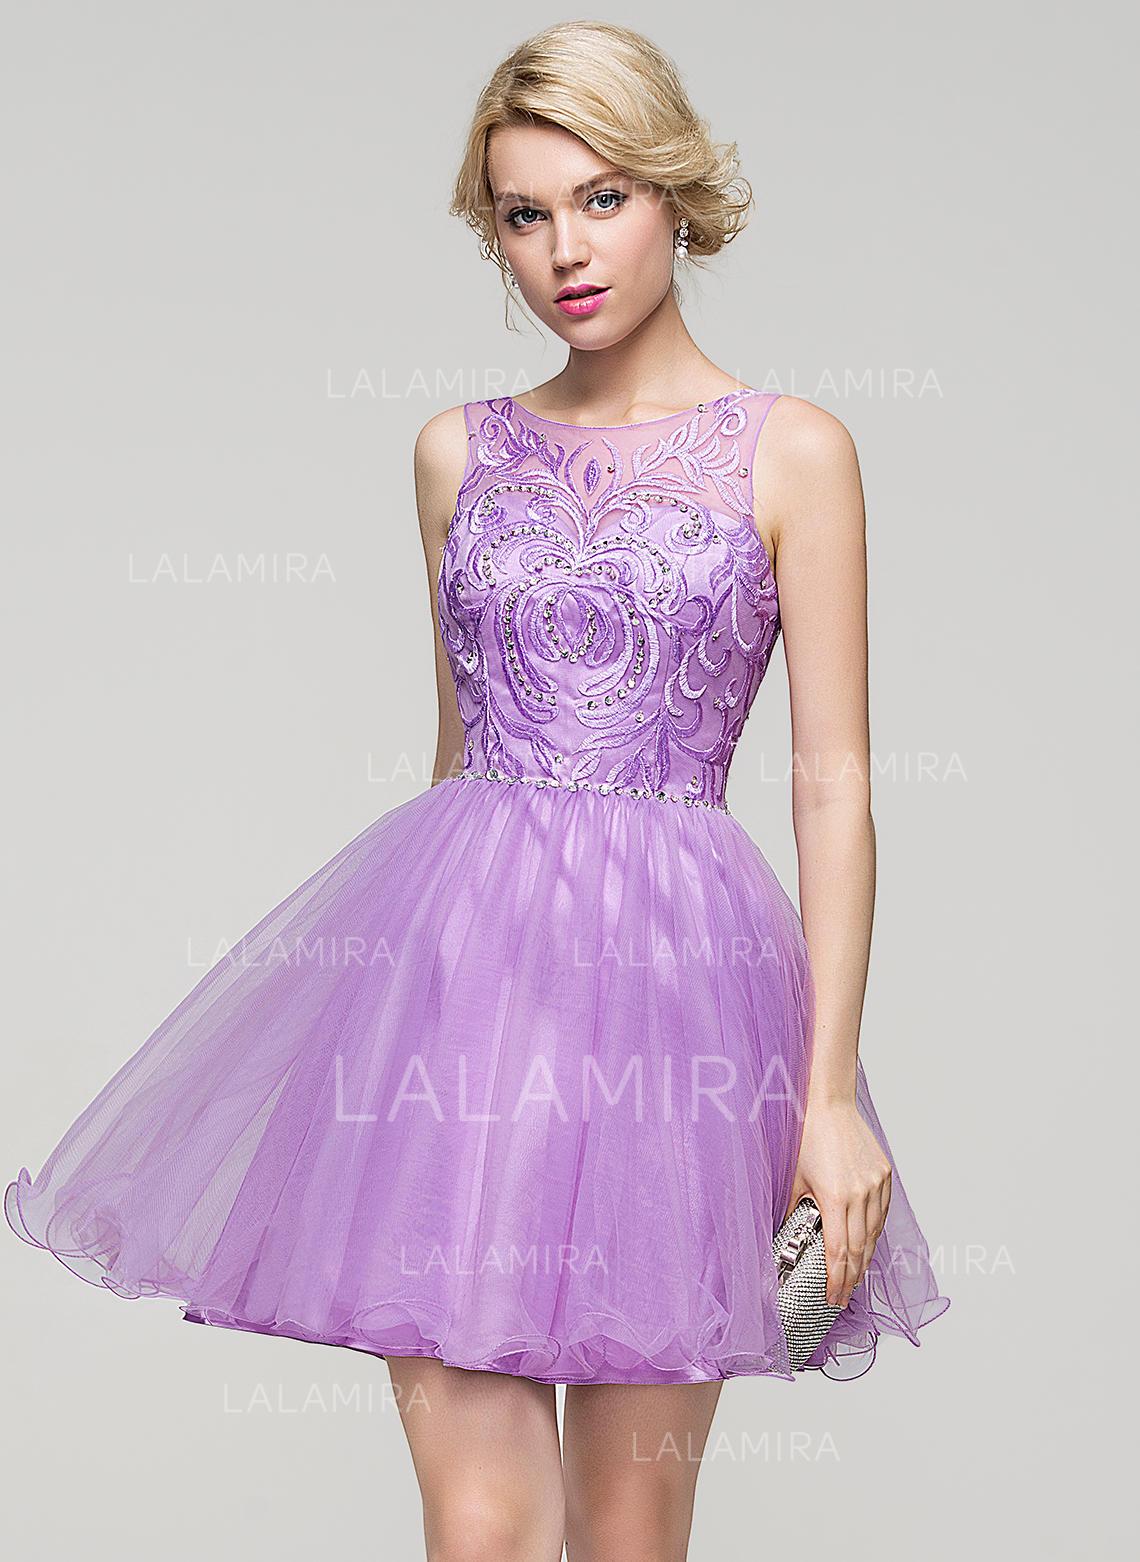 83e04367c53 A-Line Princess Short Mini Homecoming Dresses Scoop Neck Tulle Sleeveless  (022214086. Loading zoom